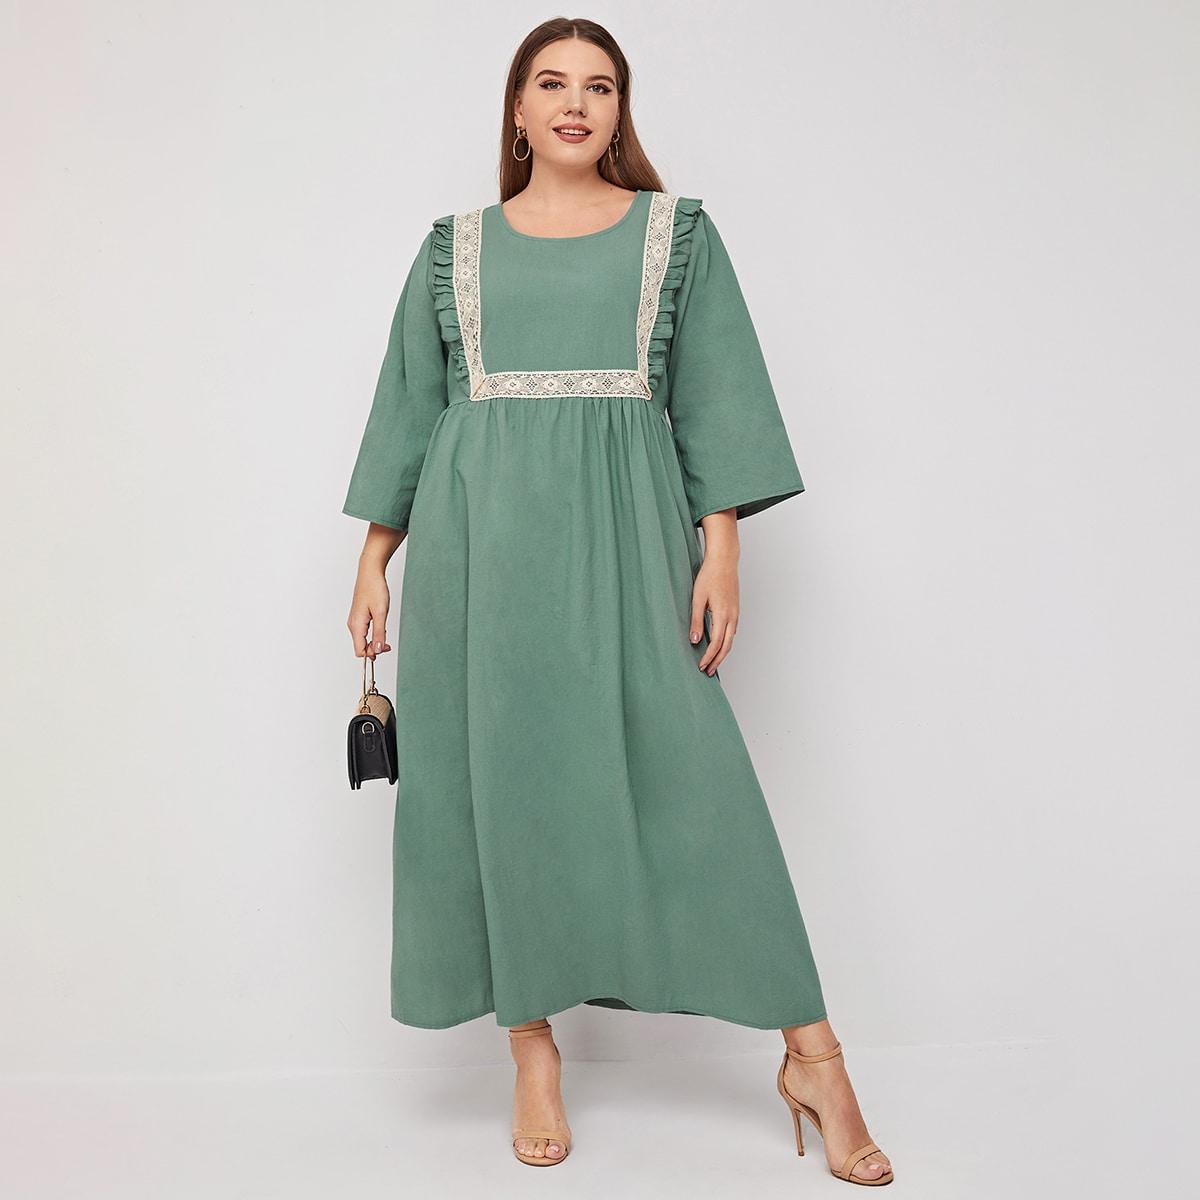 Контрастные кружева Контрастный цвет Скромный Платья размер плюс